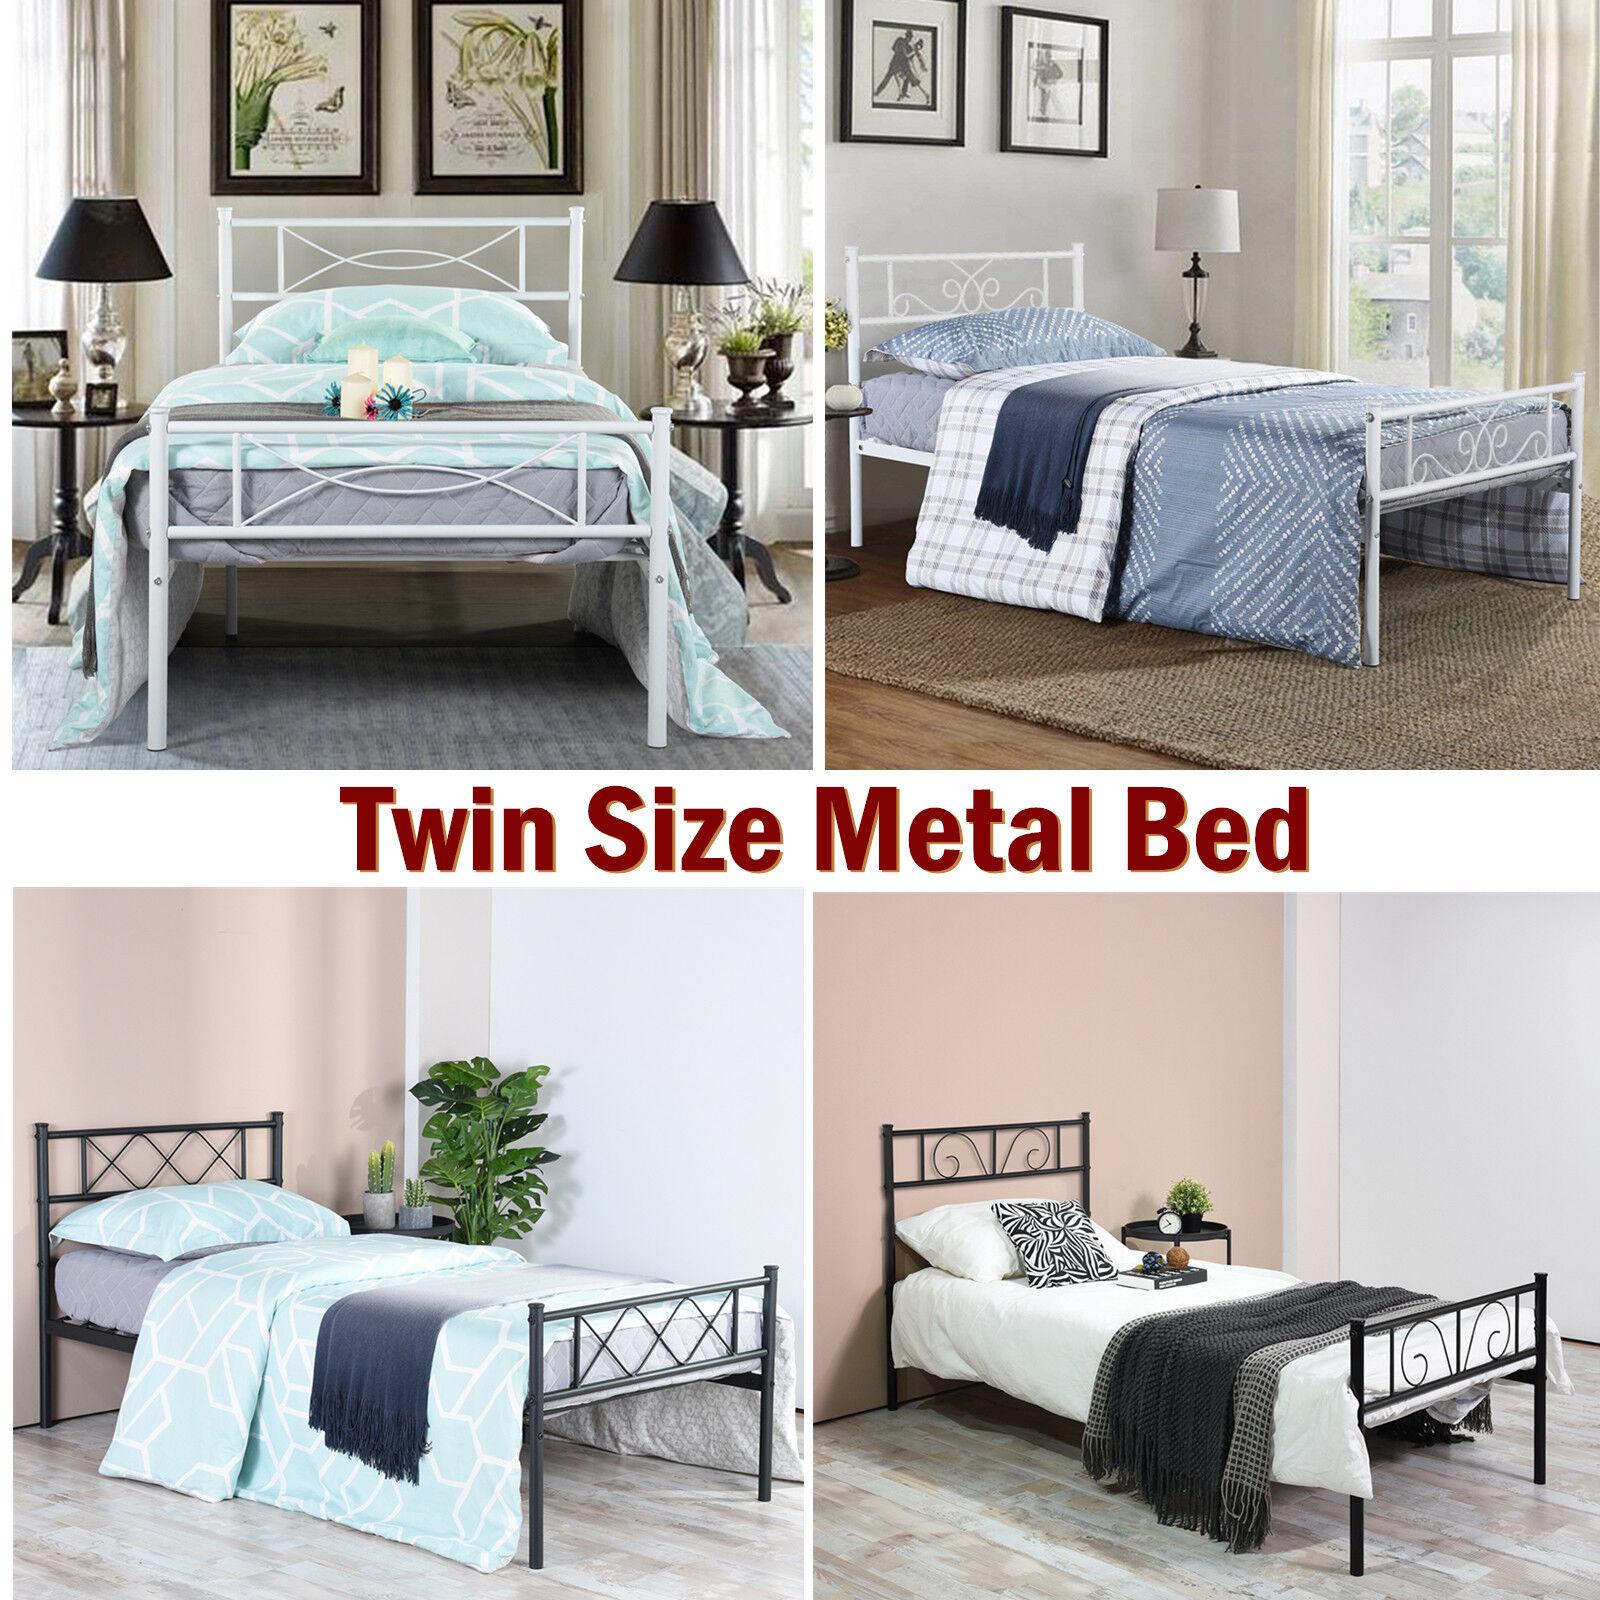 Twin Size Heavy Duty Metal Bed Frame Mattress Foundation wit